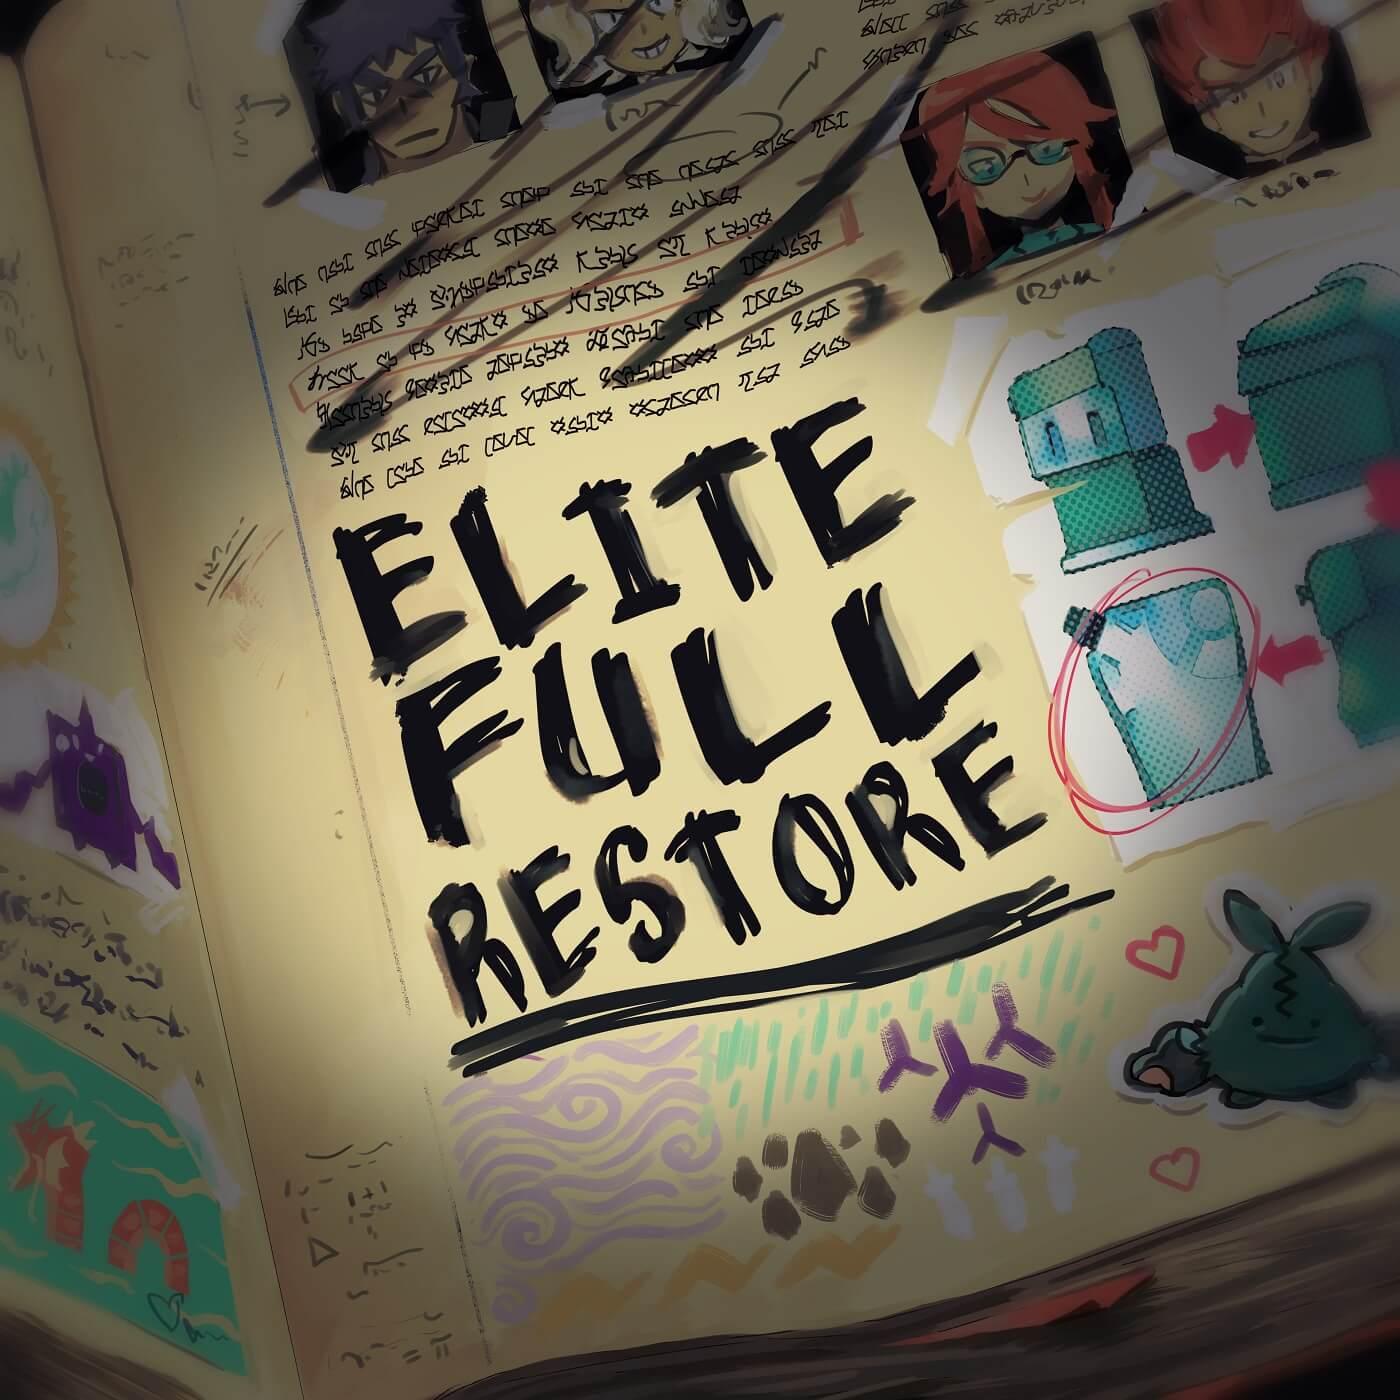 Elite Full Restore